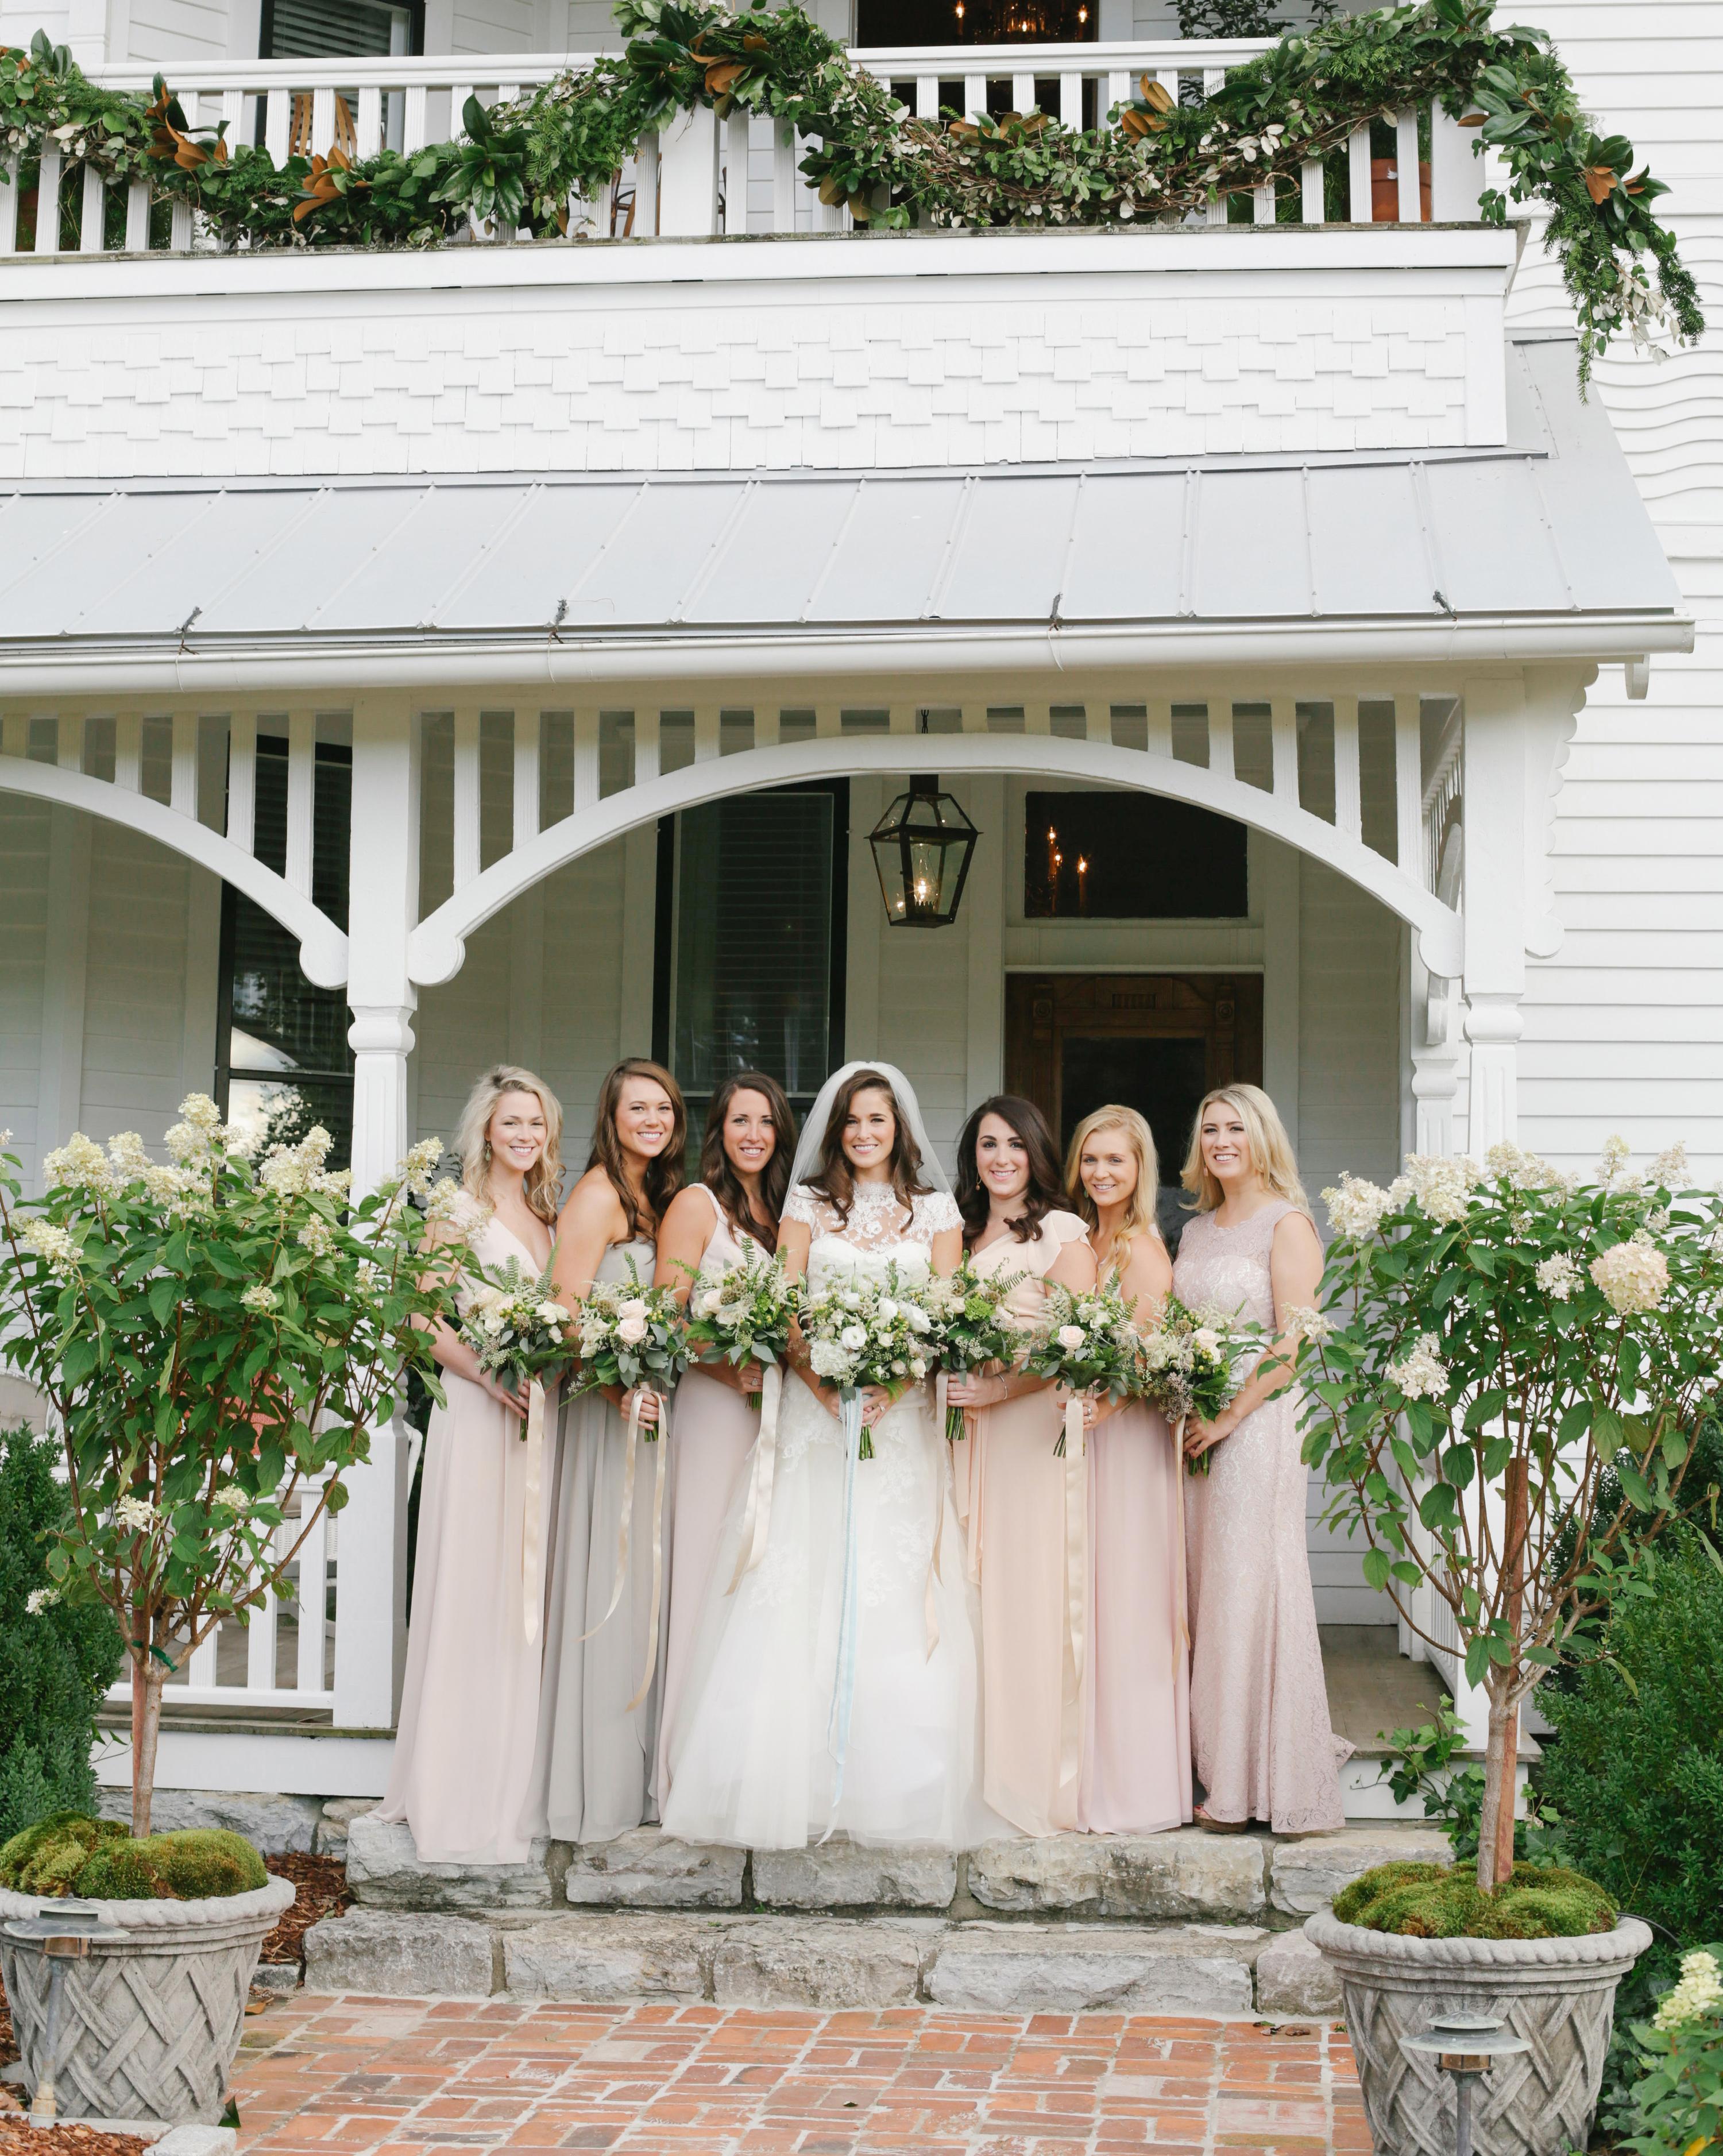 destiny-taylor-wedding-bridesmaids-122-s112347-1115.jpg